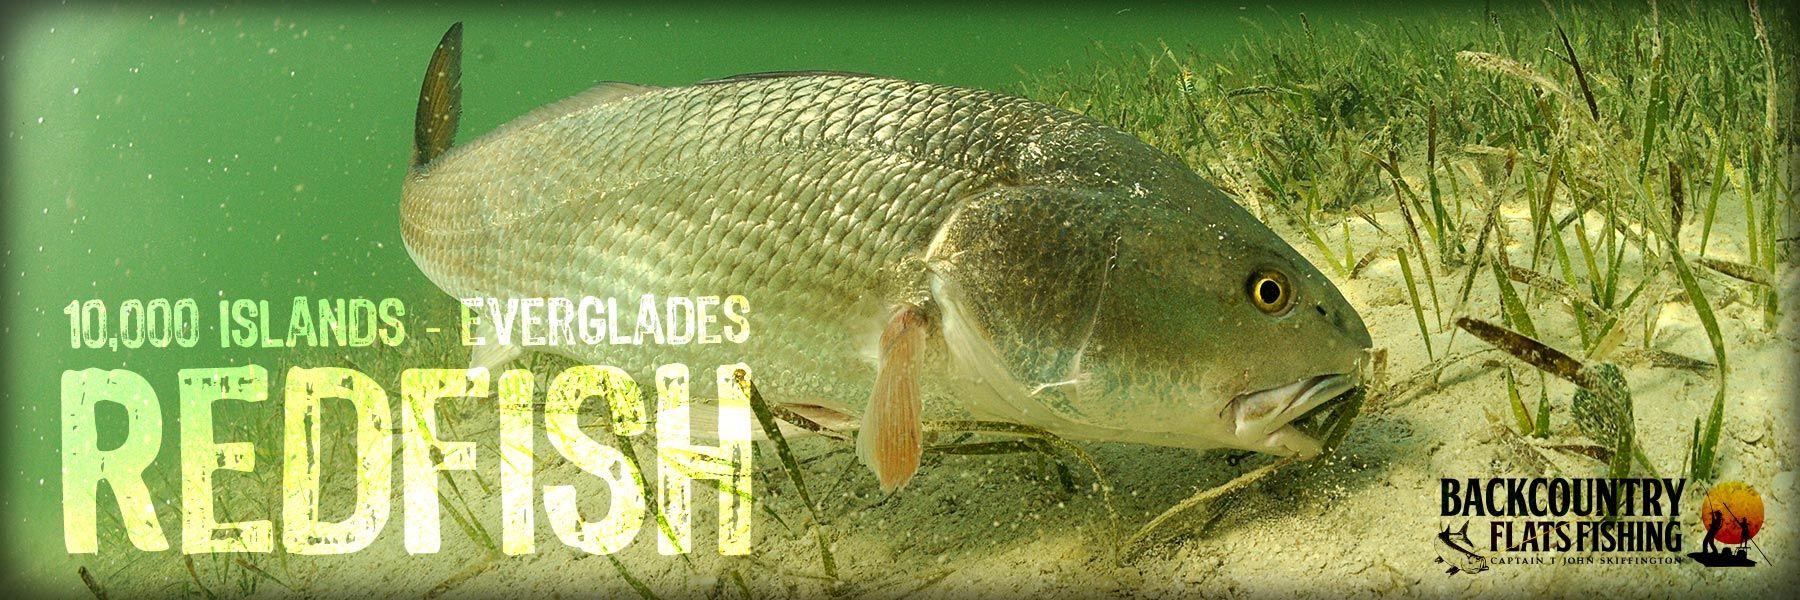 Everglades, 10000 Islands & Naples Fishing Trips with Capt T John Skiffington